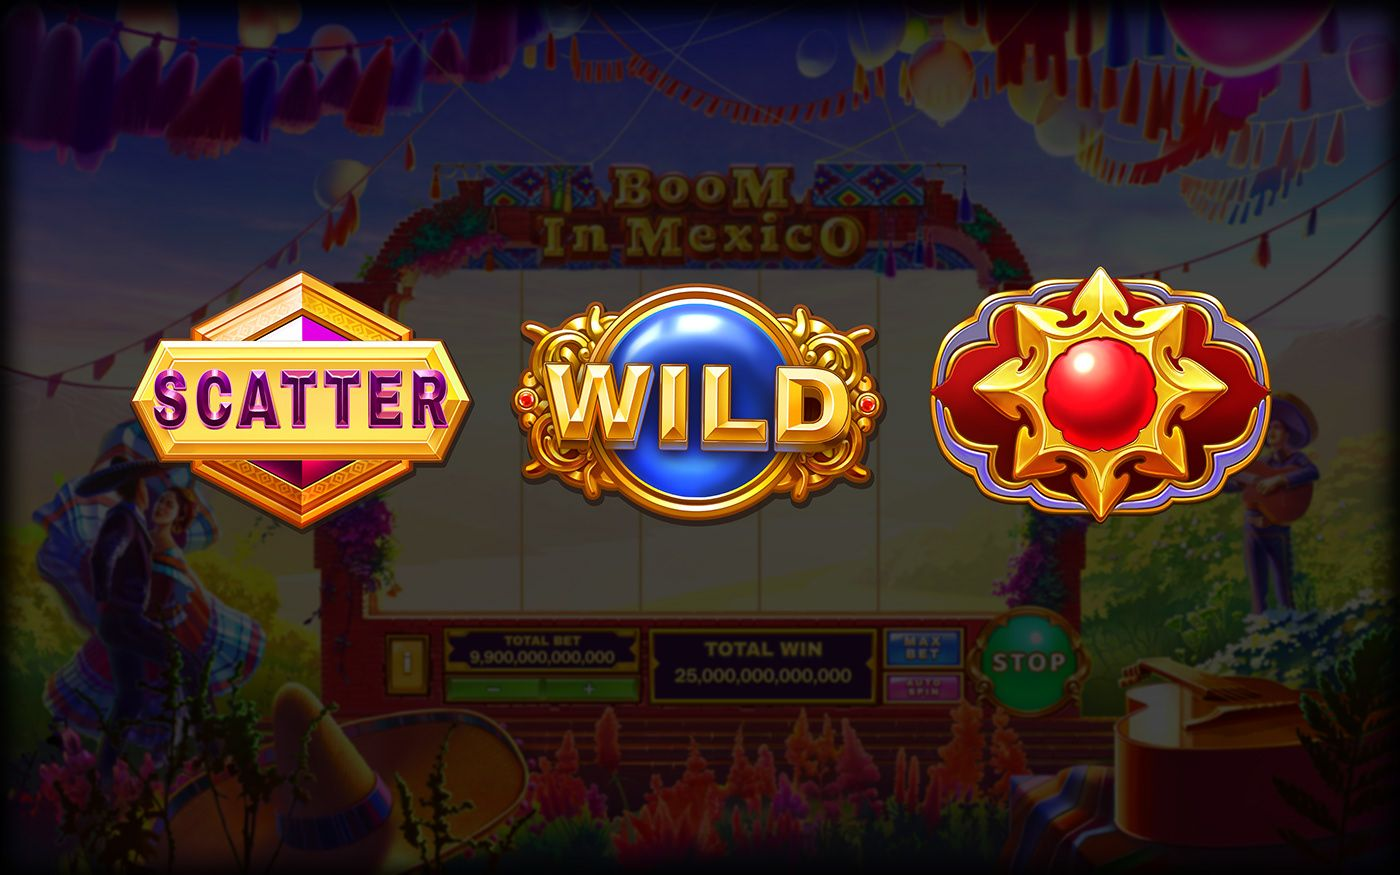 188bet casino kasinopelit arvostelu